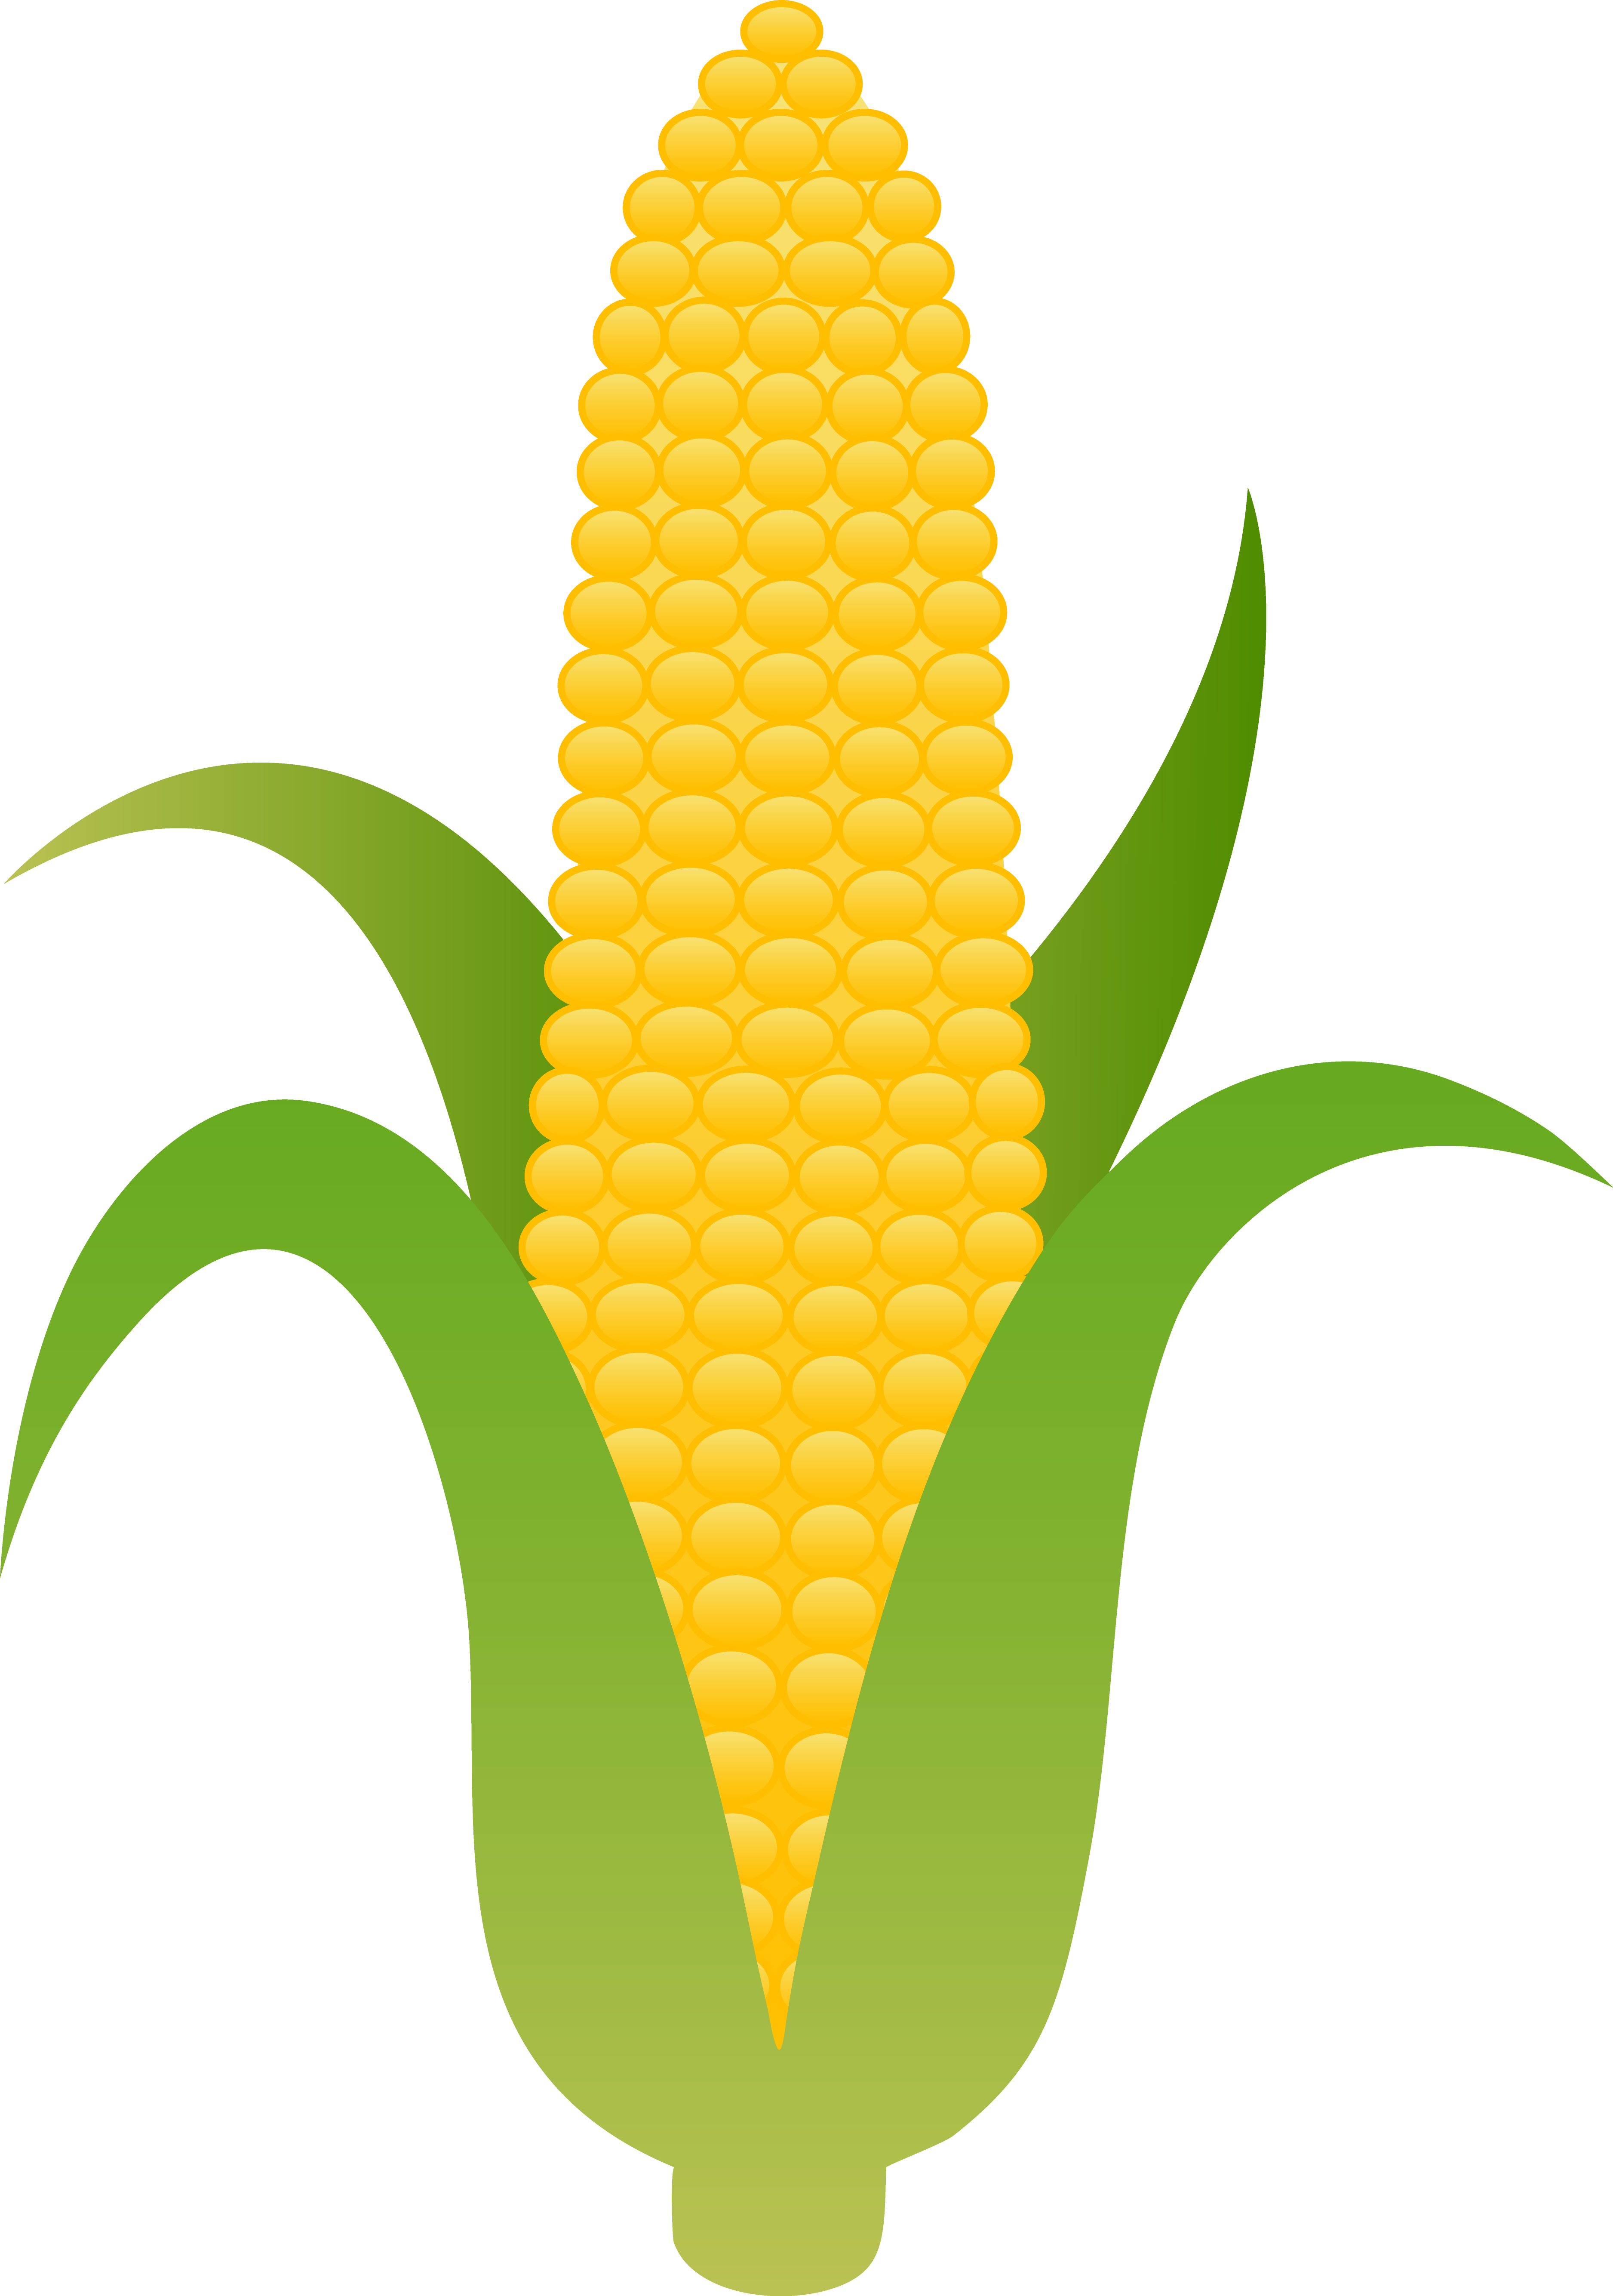 Corn Husk Clipart